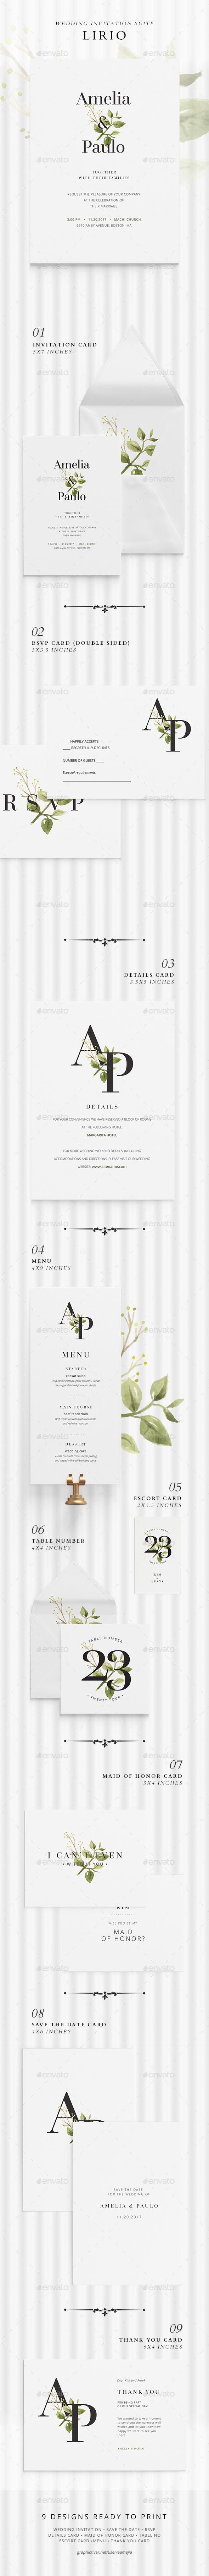 Wedding Invitation Suite - Lirio - Weddings Cards & Invites